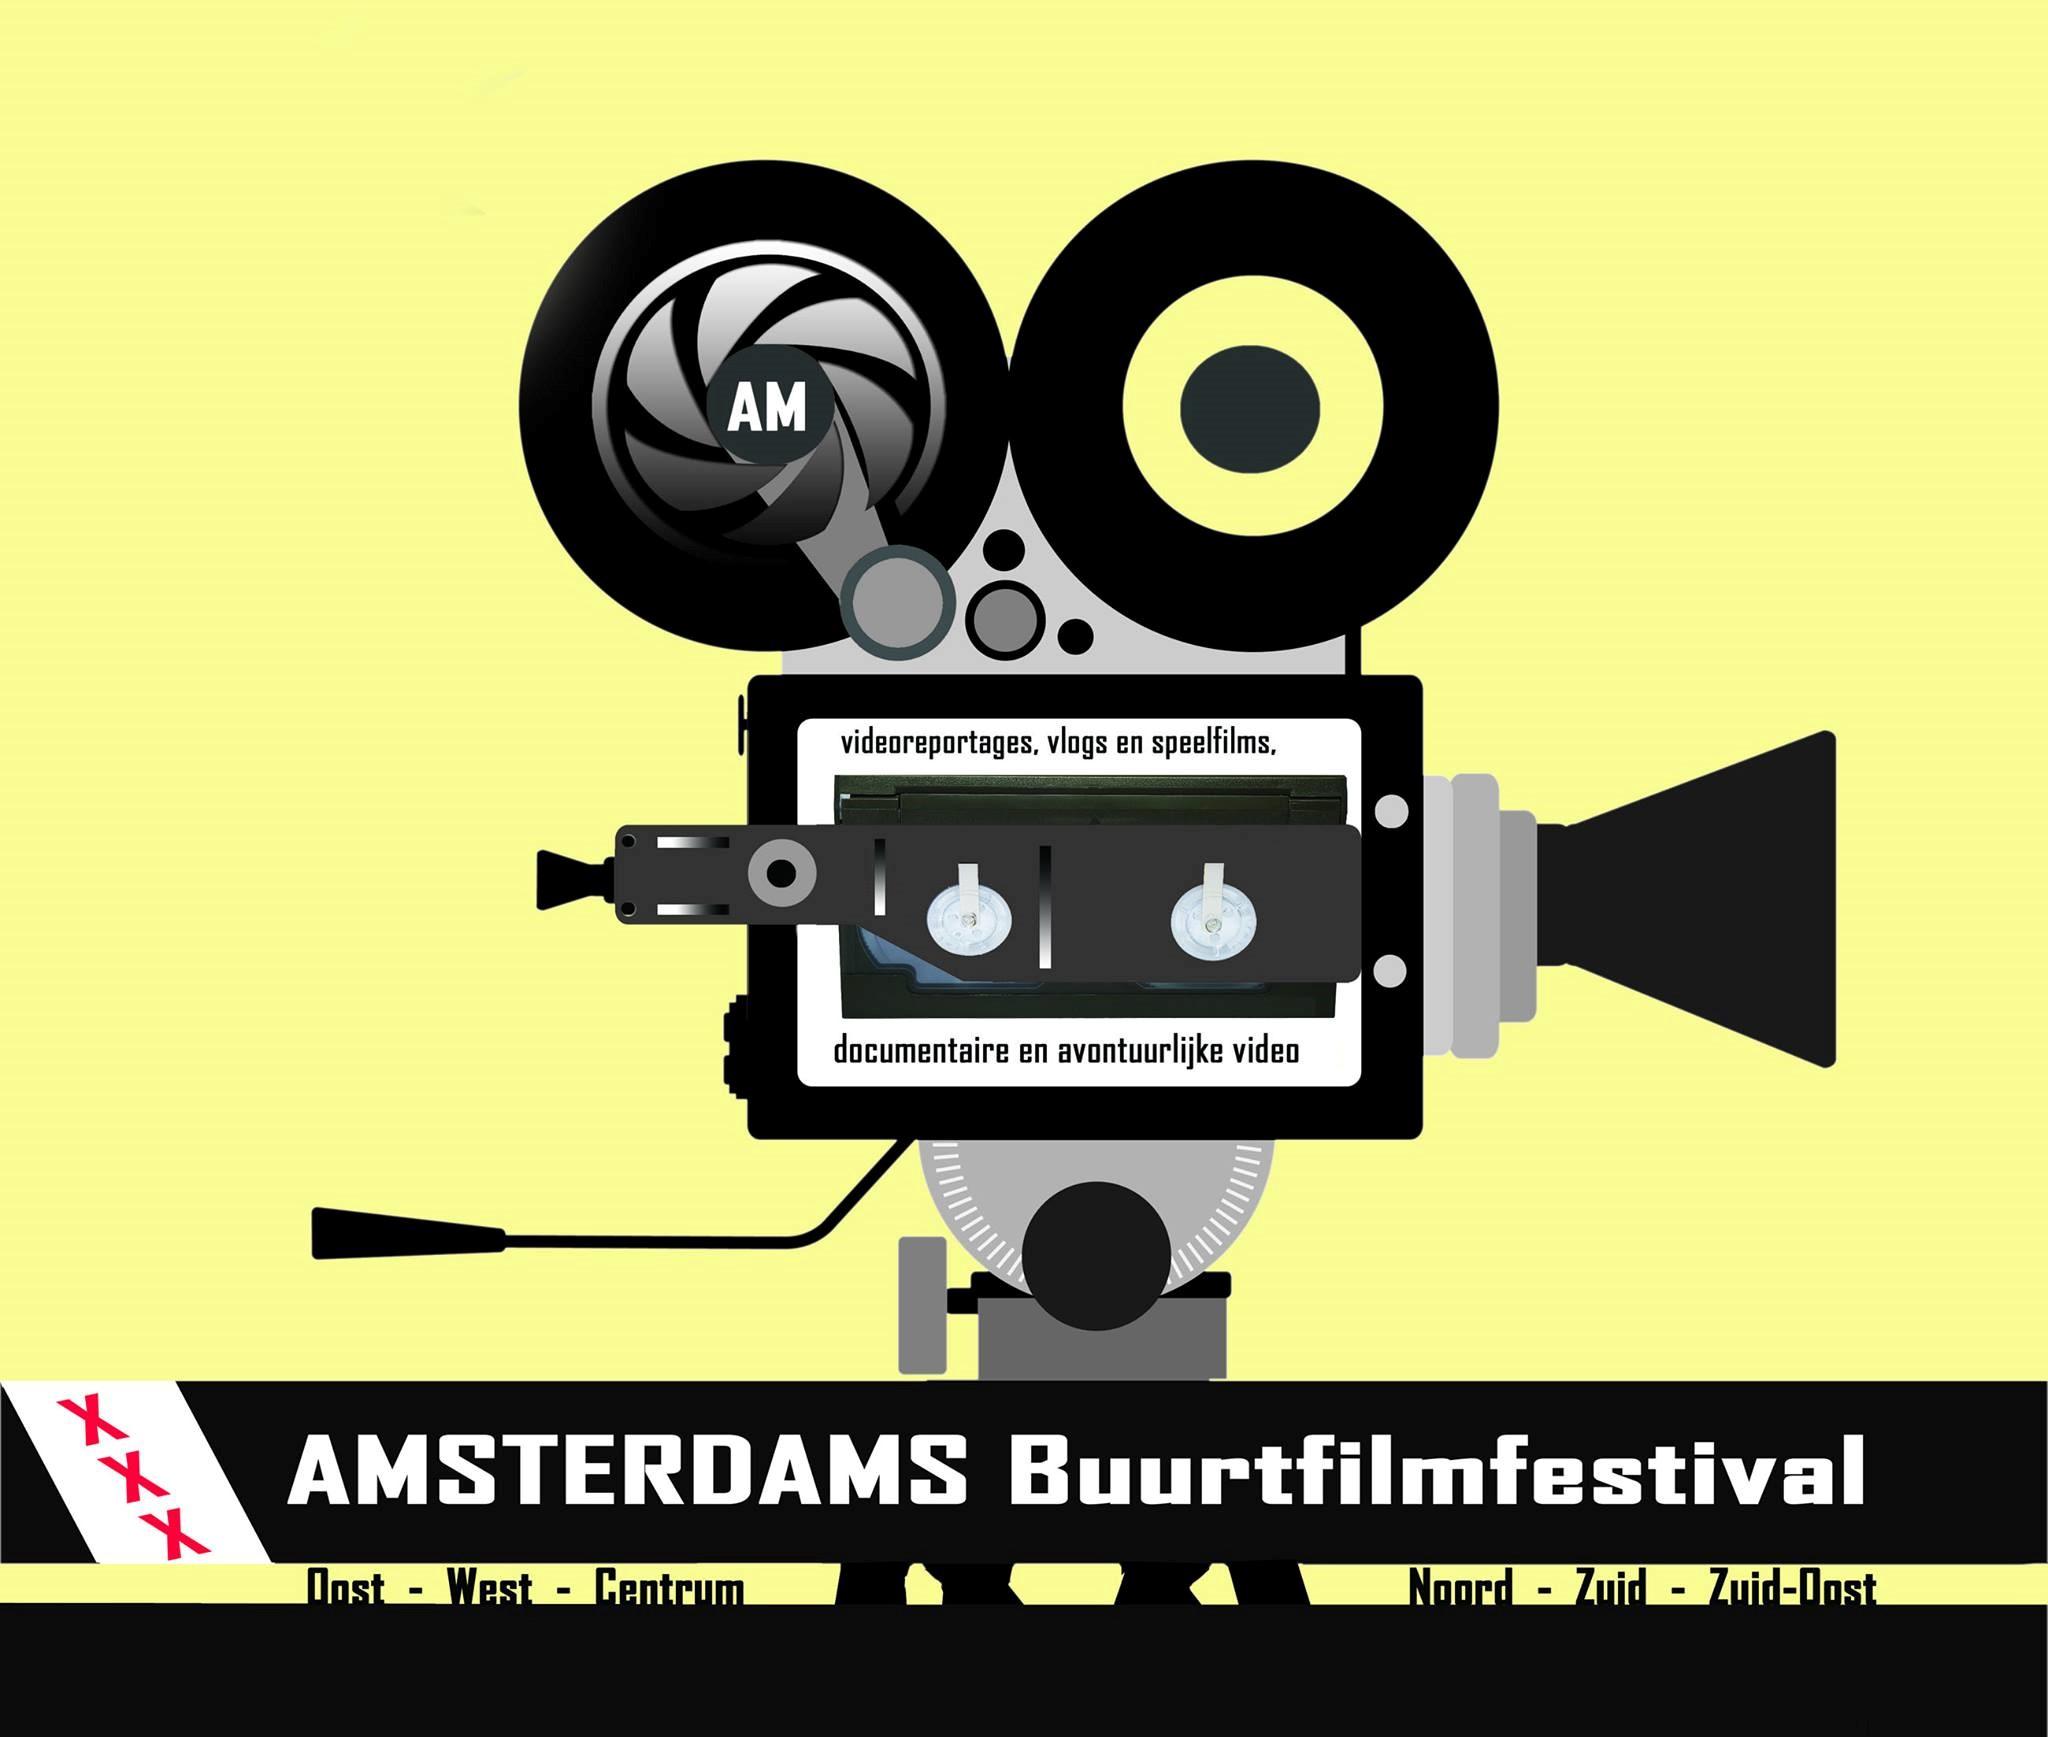 Somali4allTV wint AMSTERDAMS Buurtfilmfestival 2016 Publieksprijs